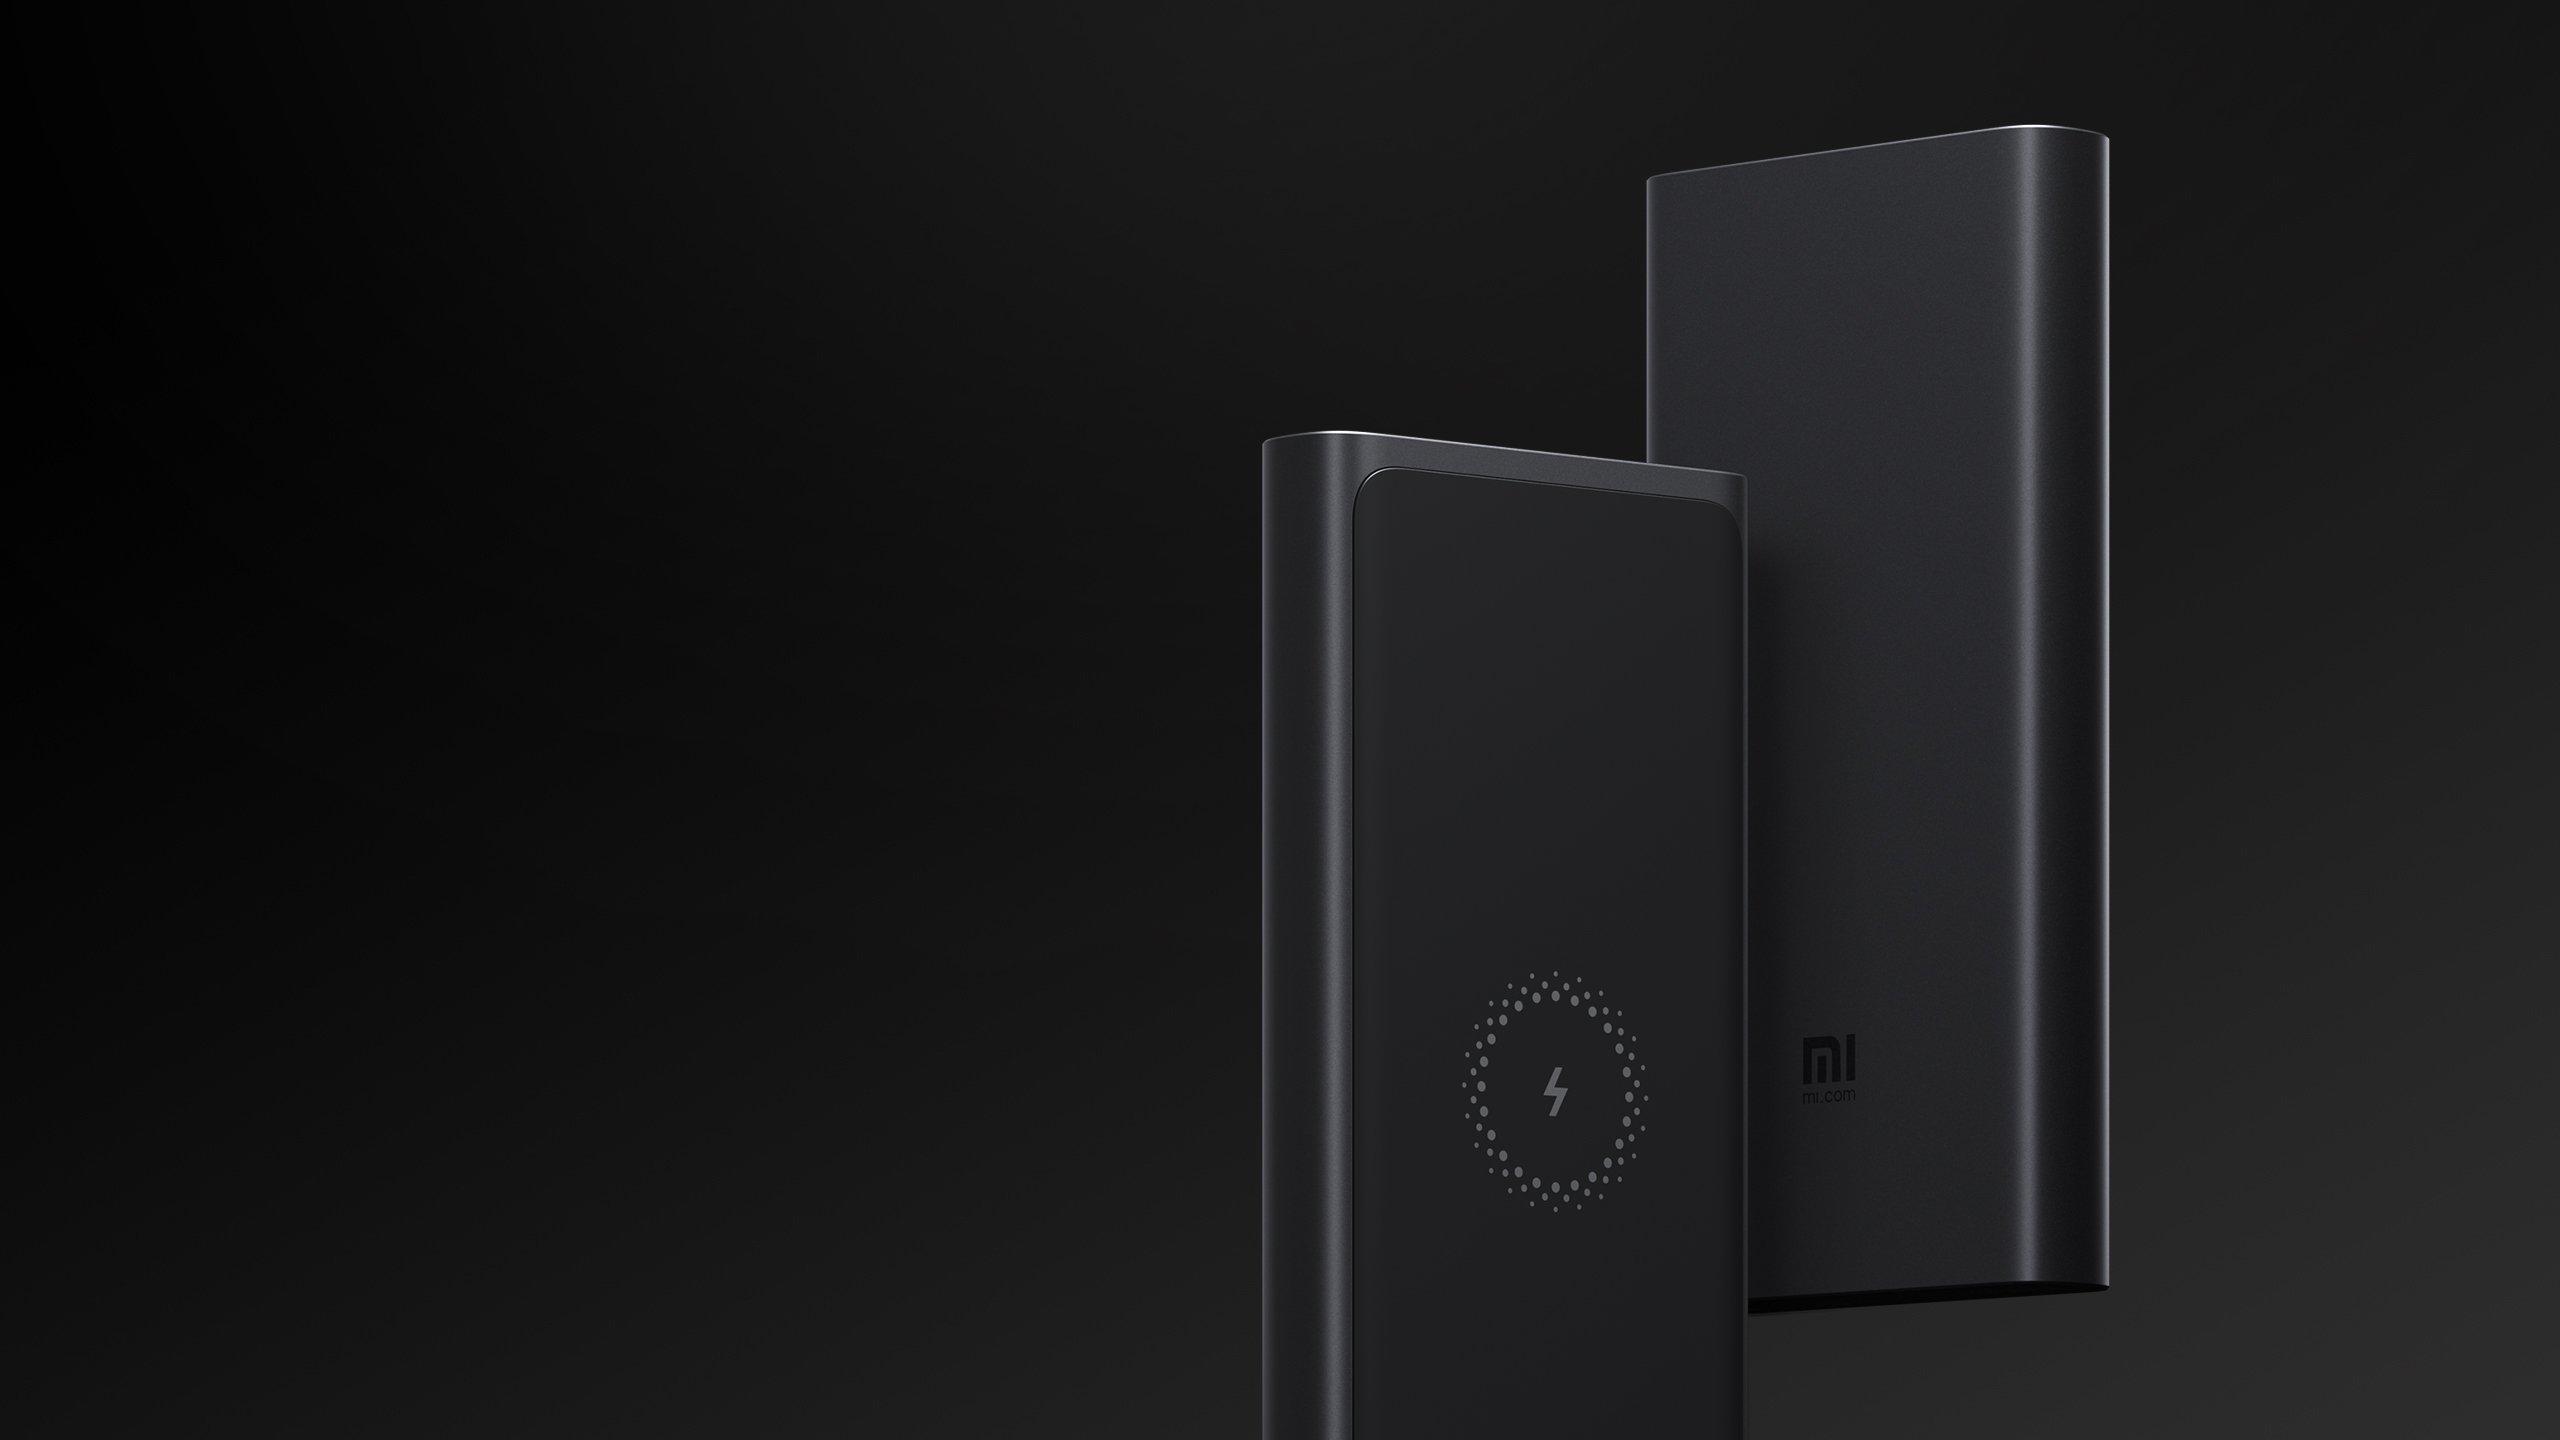 https://i01.appmifile.com/webfile/globalimg/products/pc/10000mAh-mi-wireless-power-bank//10000mah-mi-bank.jpg